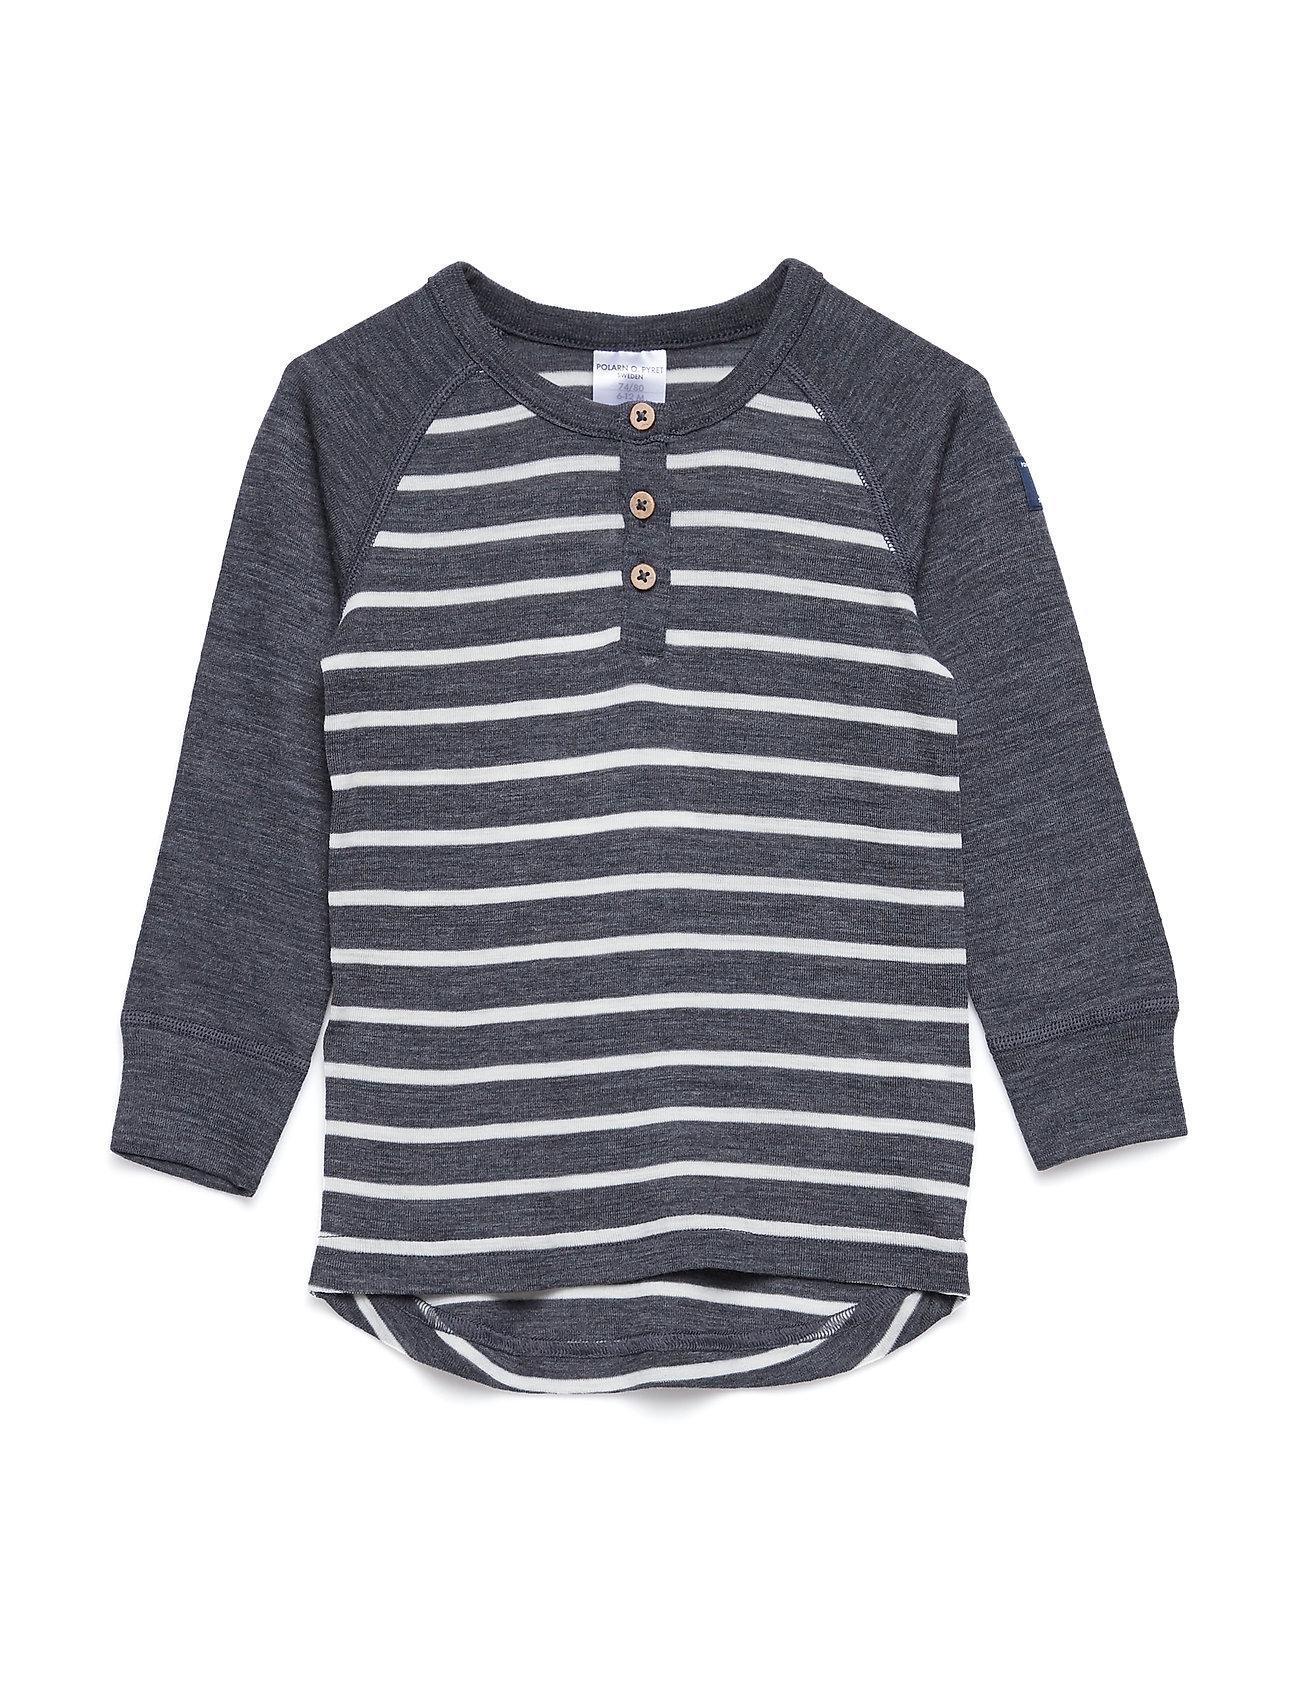 Polarn O. Pyret Sweater Wool Striped Baby